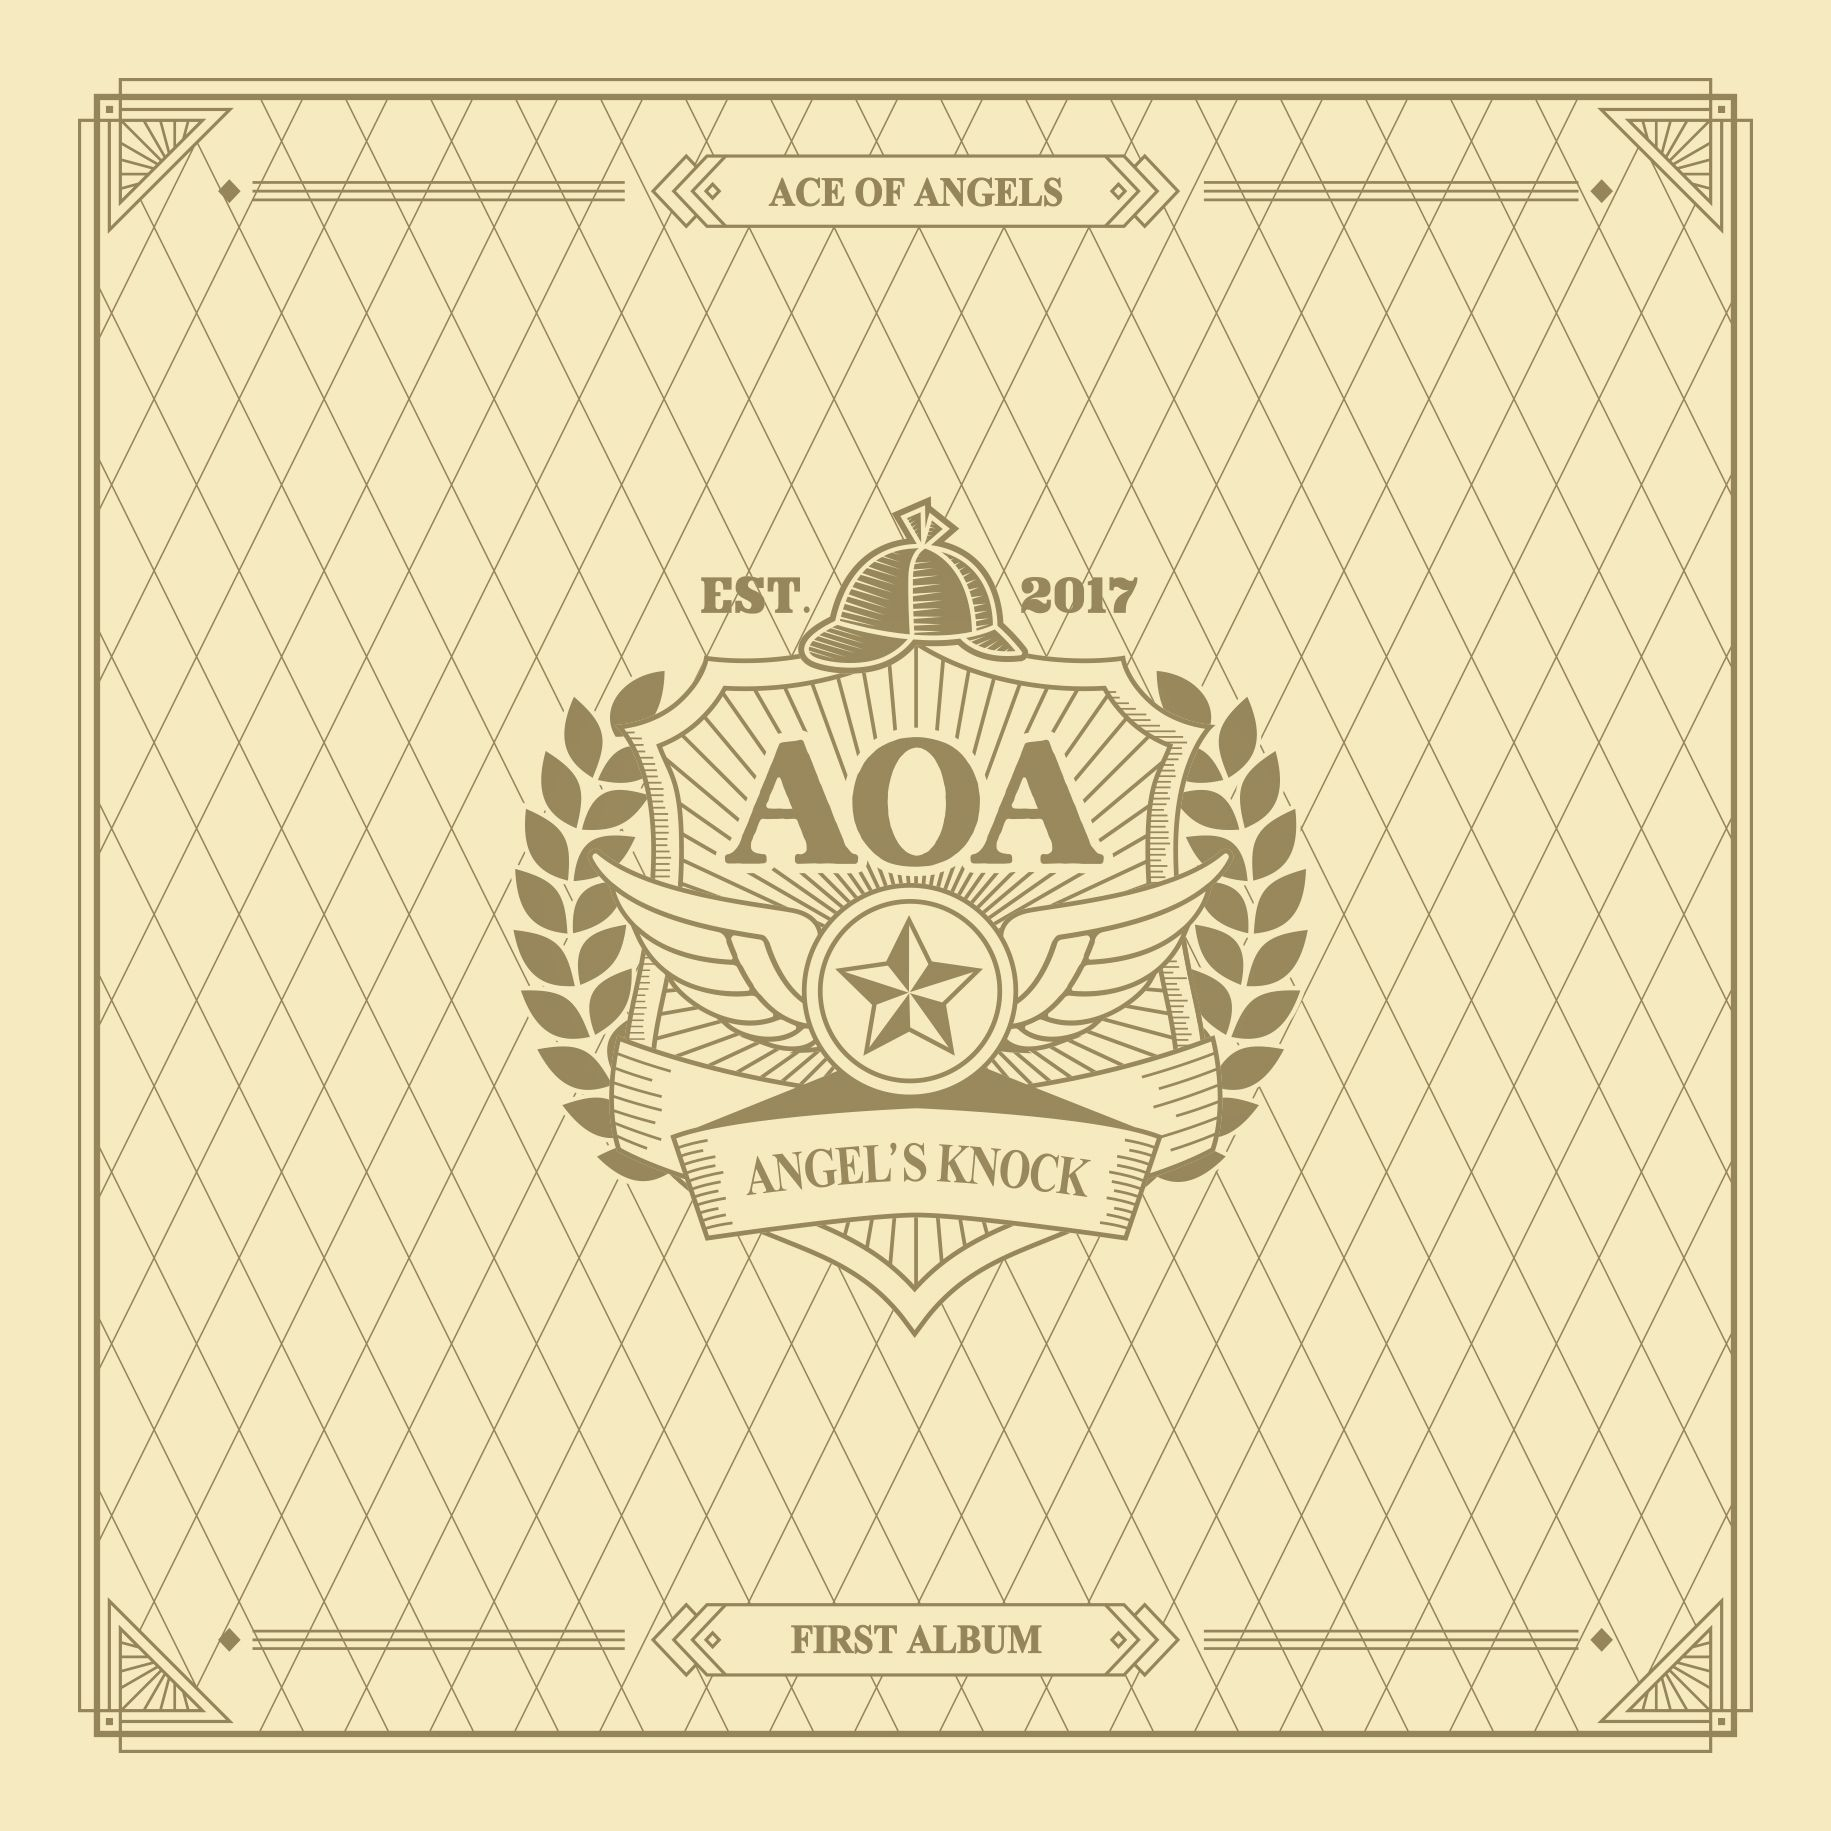 20170201.02.01 AOA - Angel's Knock cover.jpg